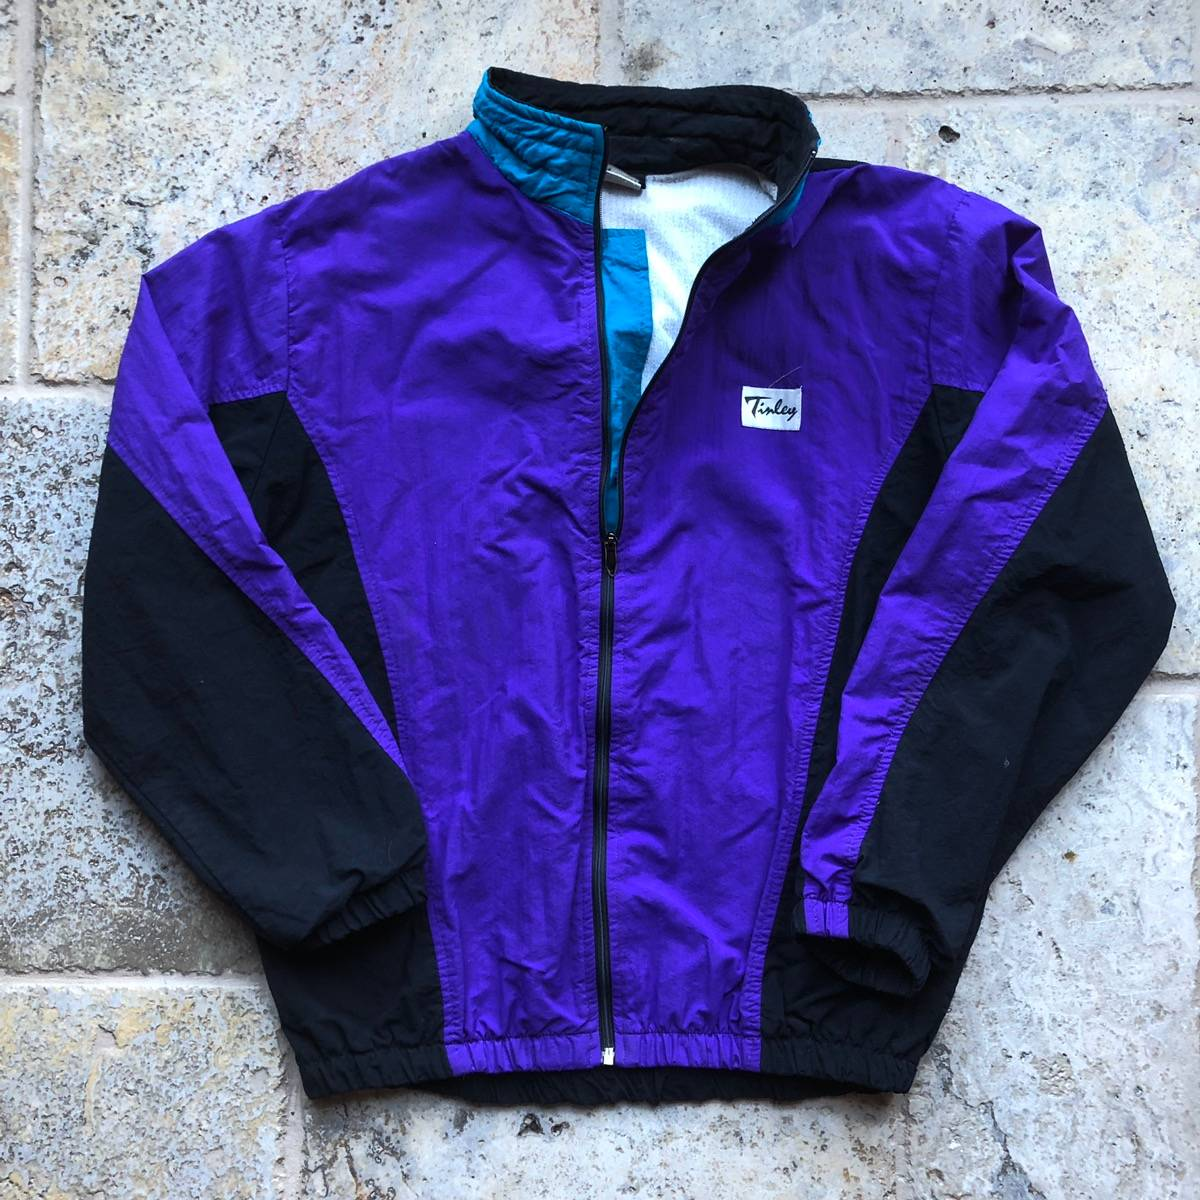 Vintage Tinley PurpleTeal 90s Zip Up Windbreaker Jacket